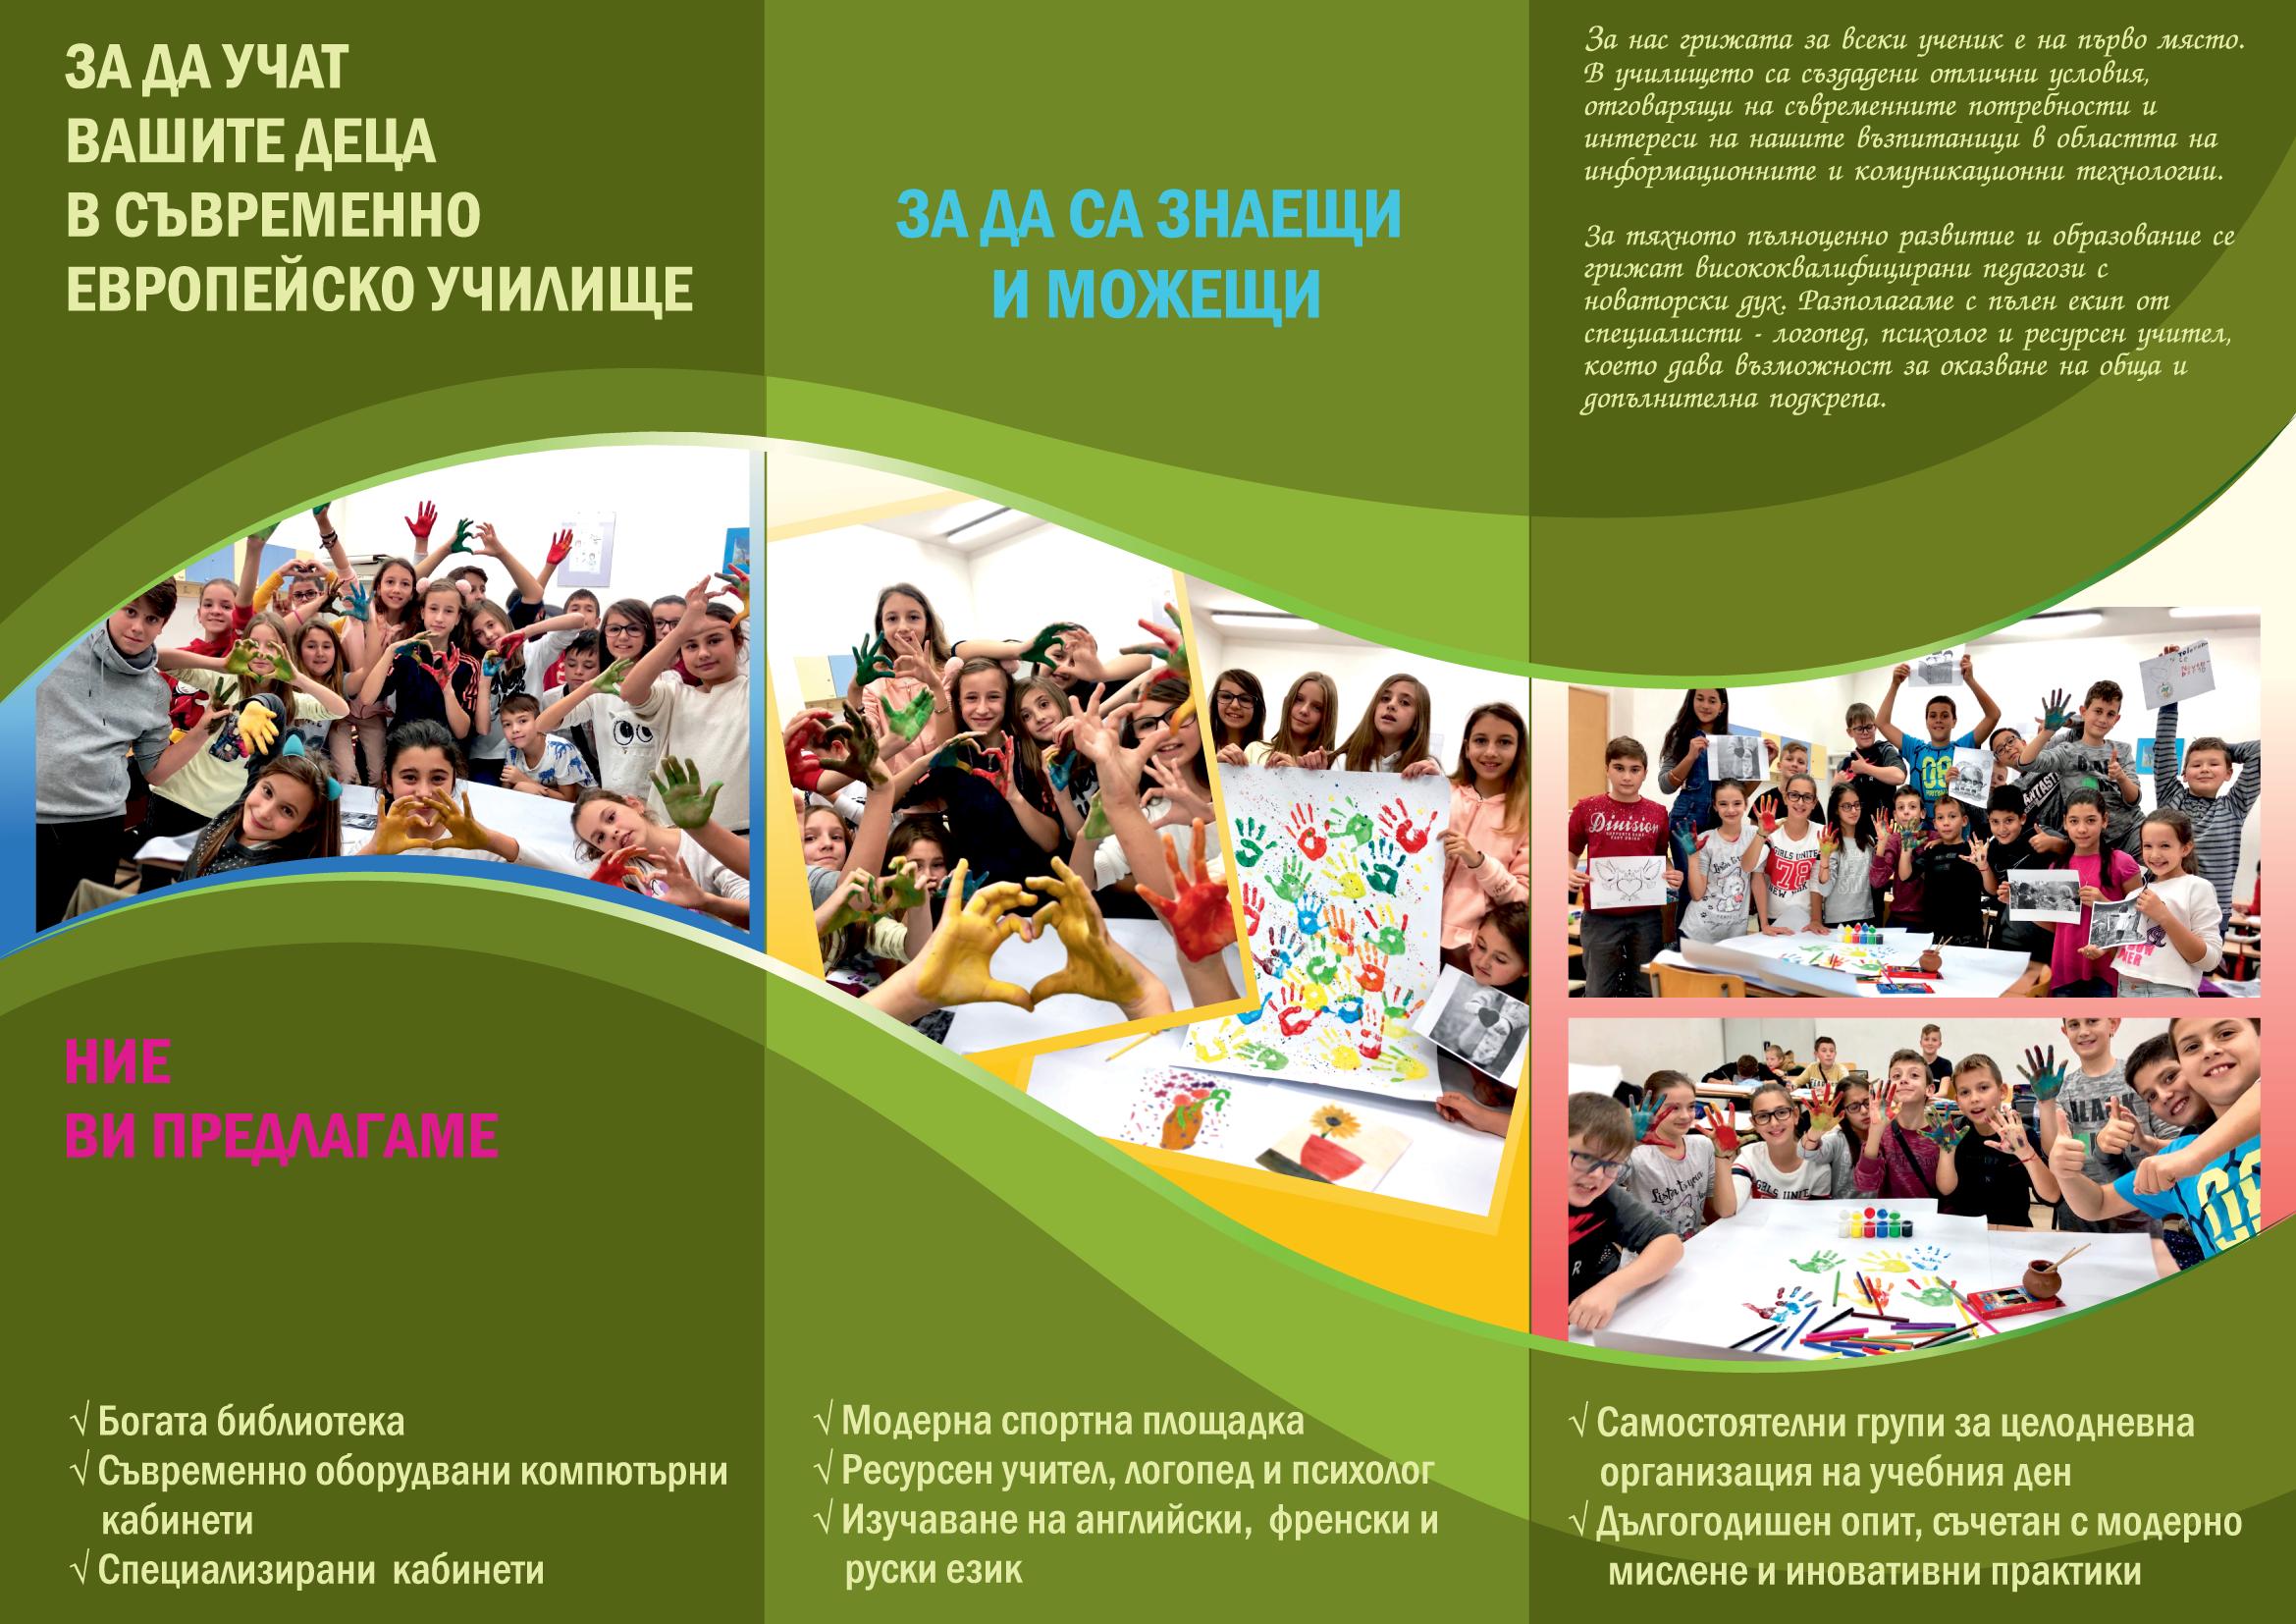 broshura1klasp22019.png